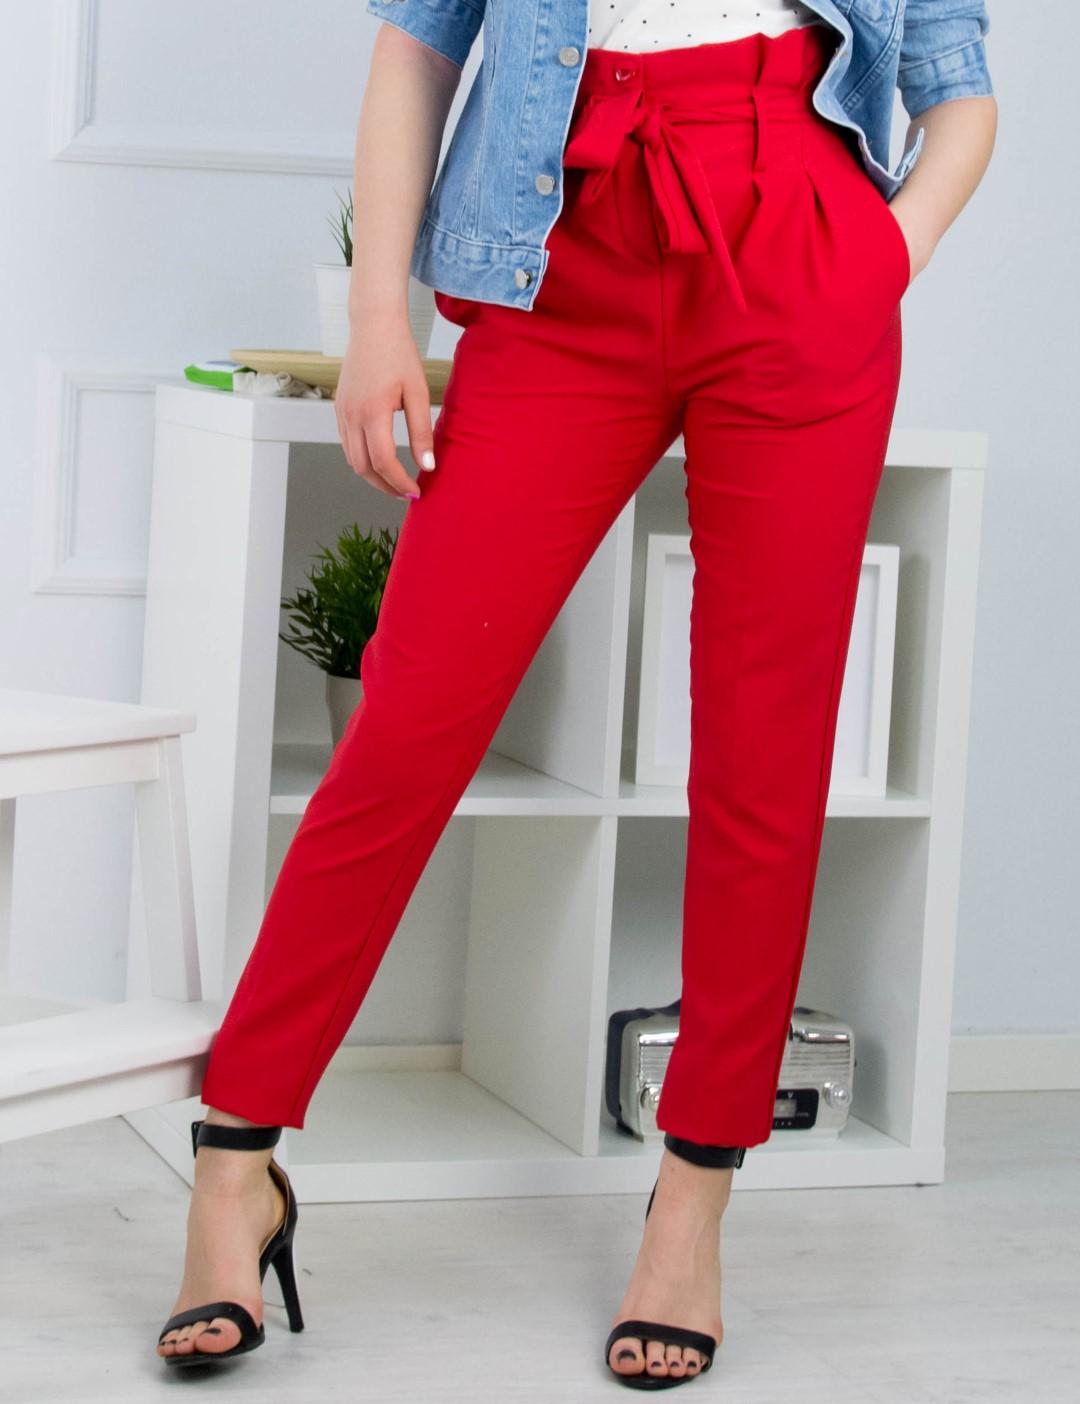 2a5ea155bd2 Γυναικεία ώχρα ψηλόμεσο υφασμάτινο παντελόνι 151211Z | Fashion Voucher